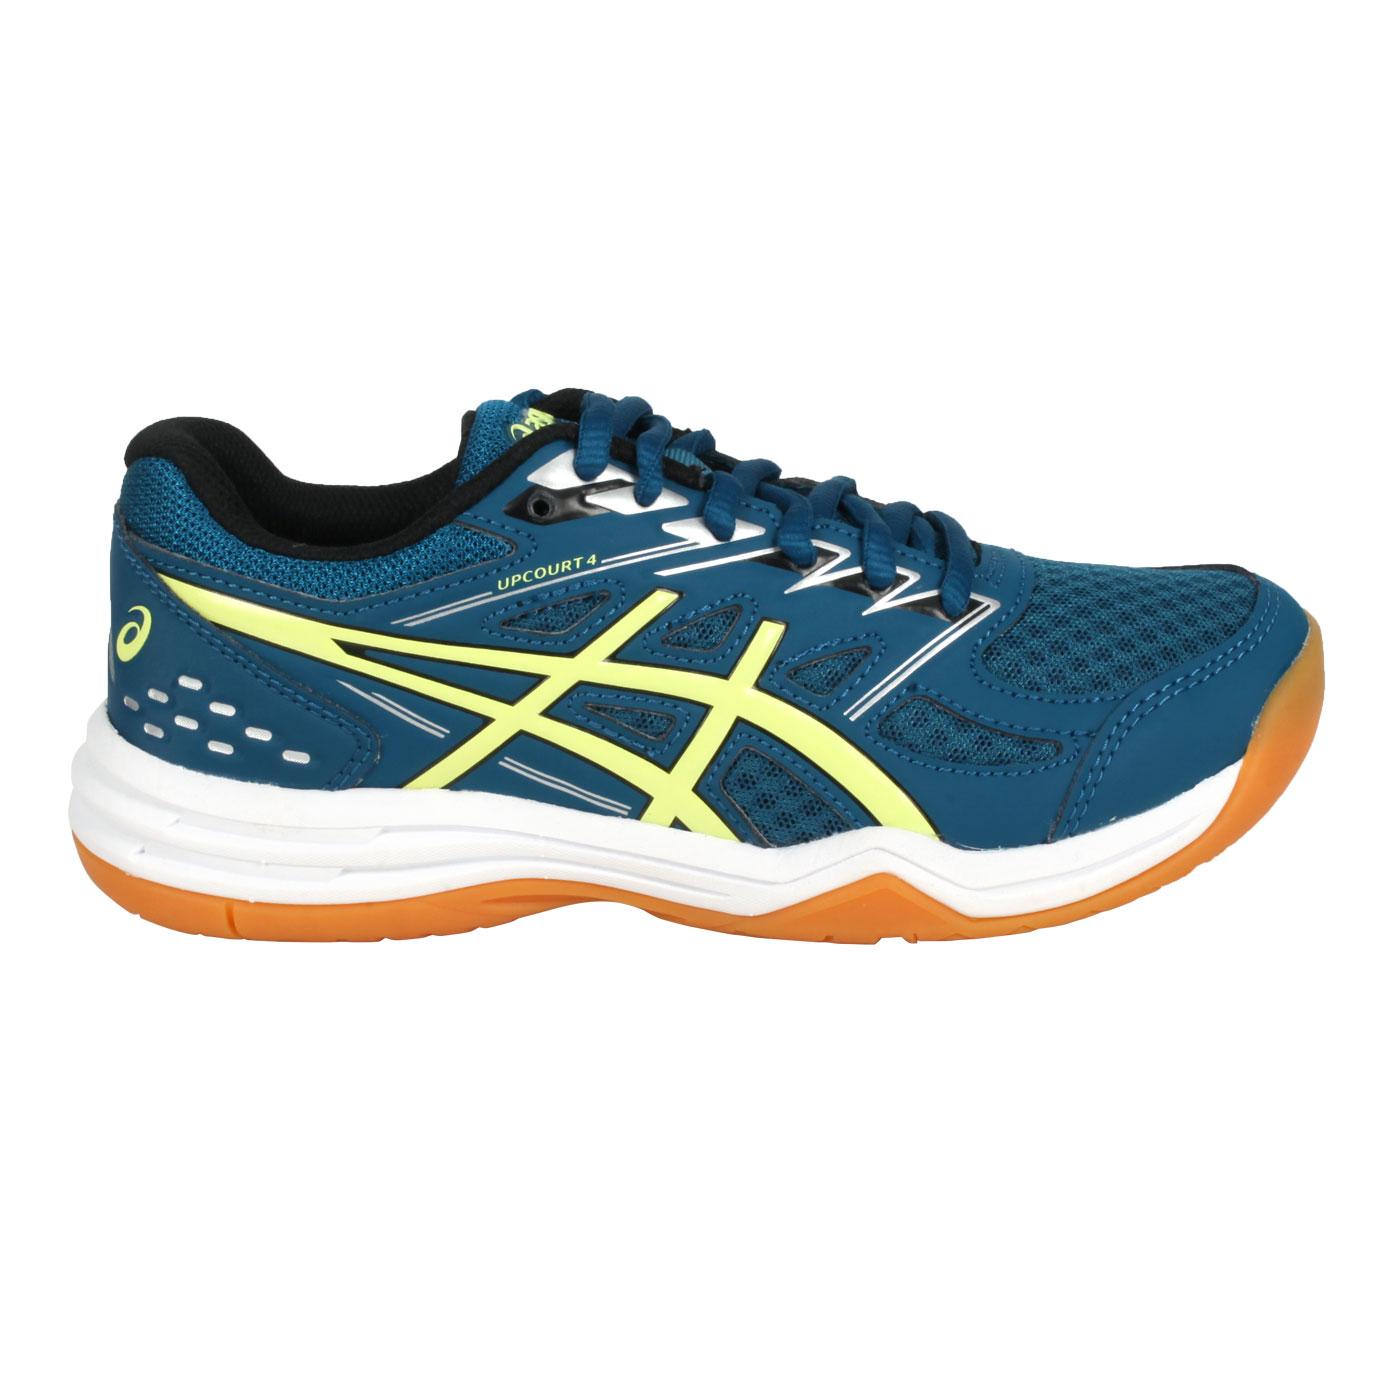 ASICS 大童排羽球鞋  @UPCOURT 4 GS@1074A027-404